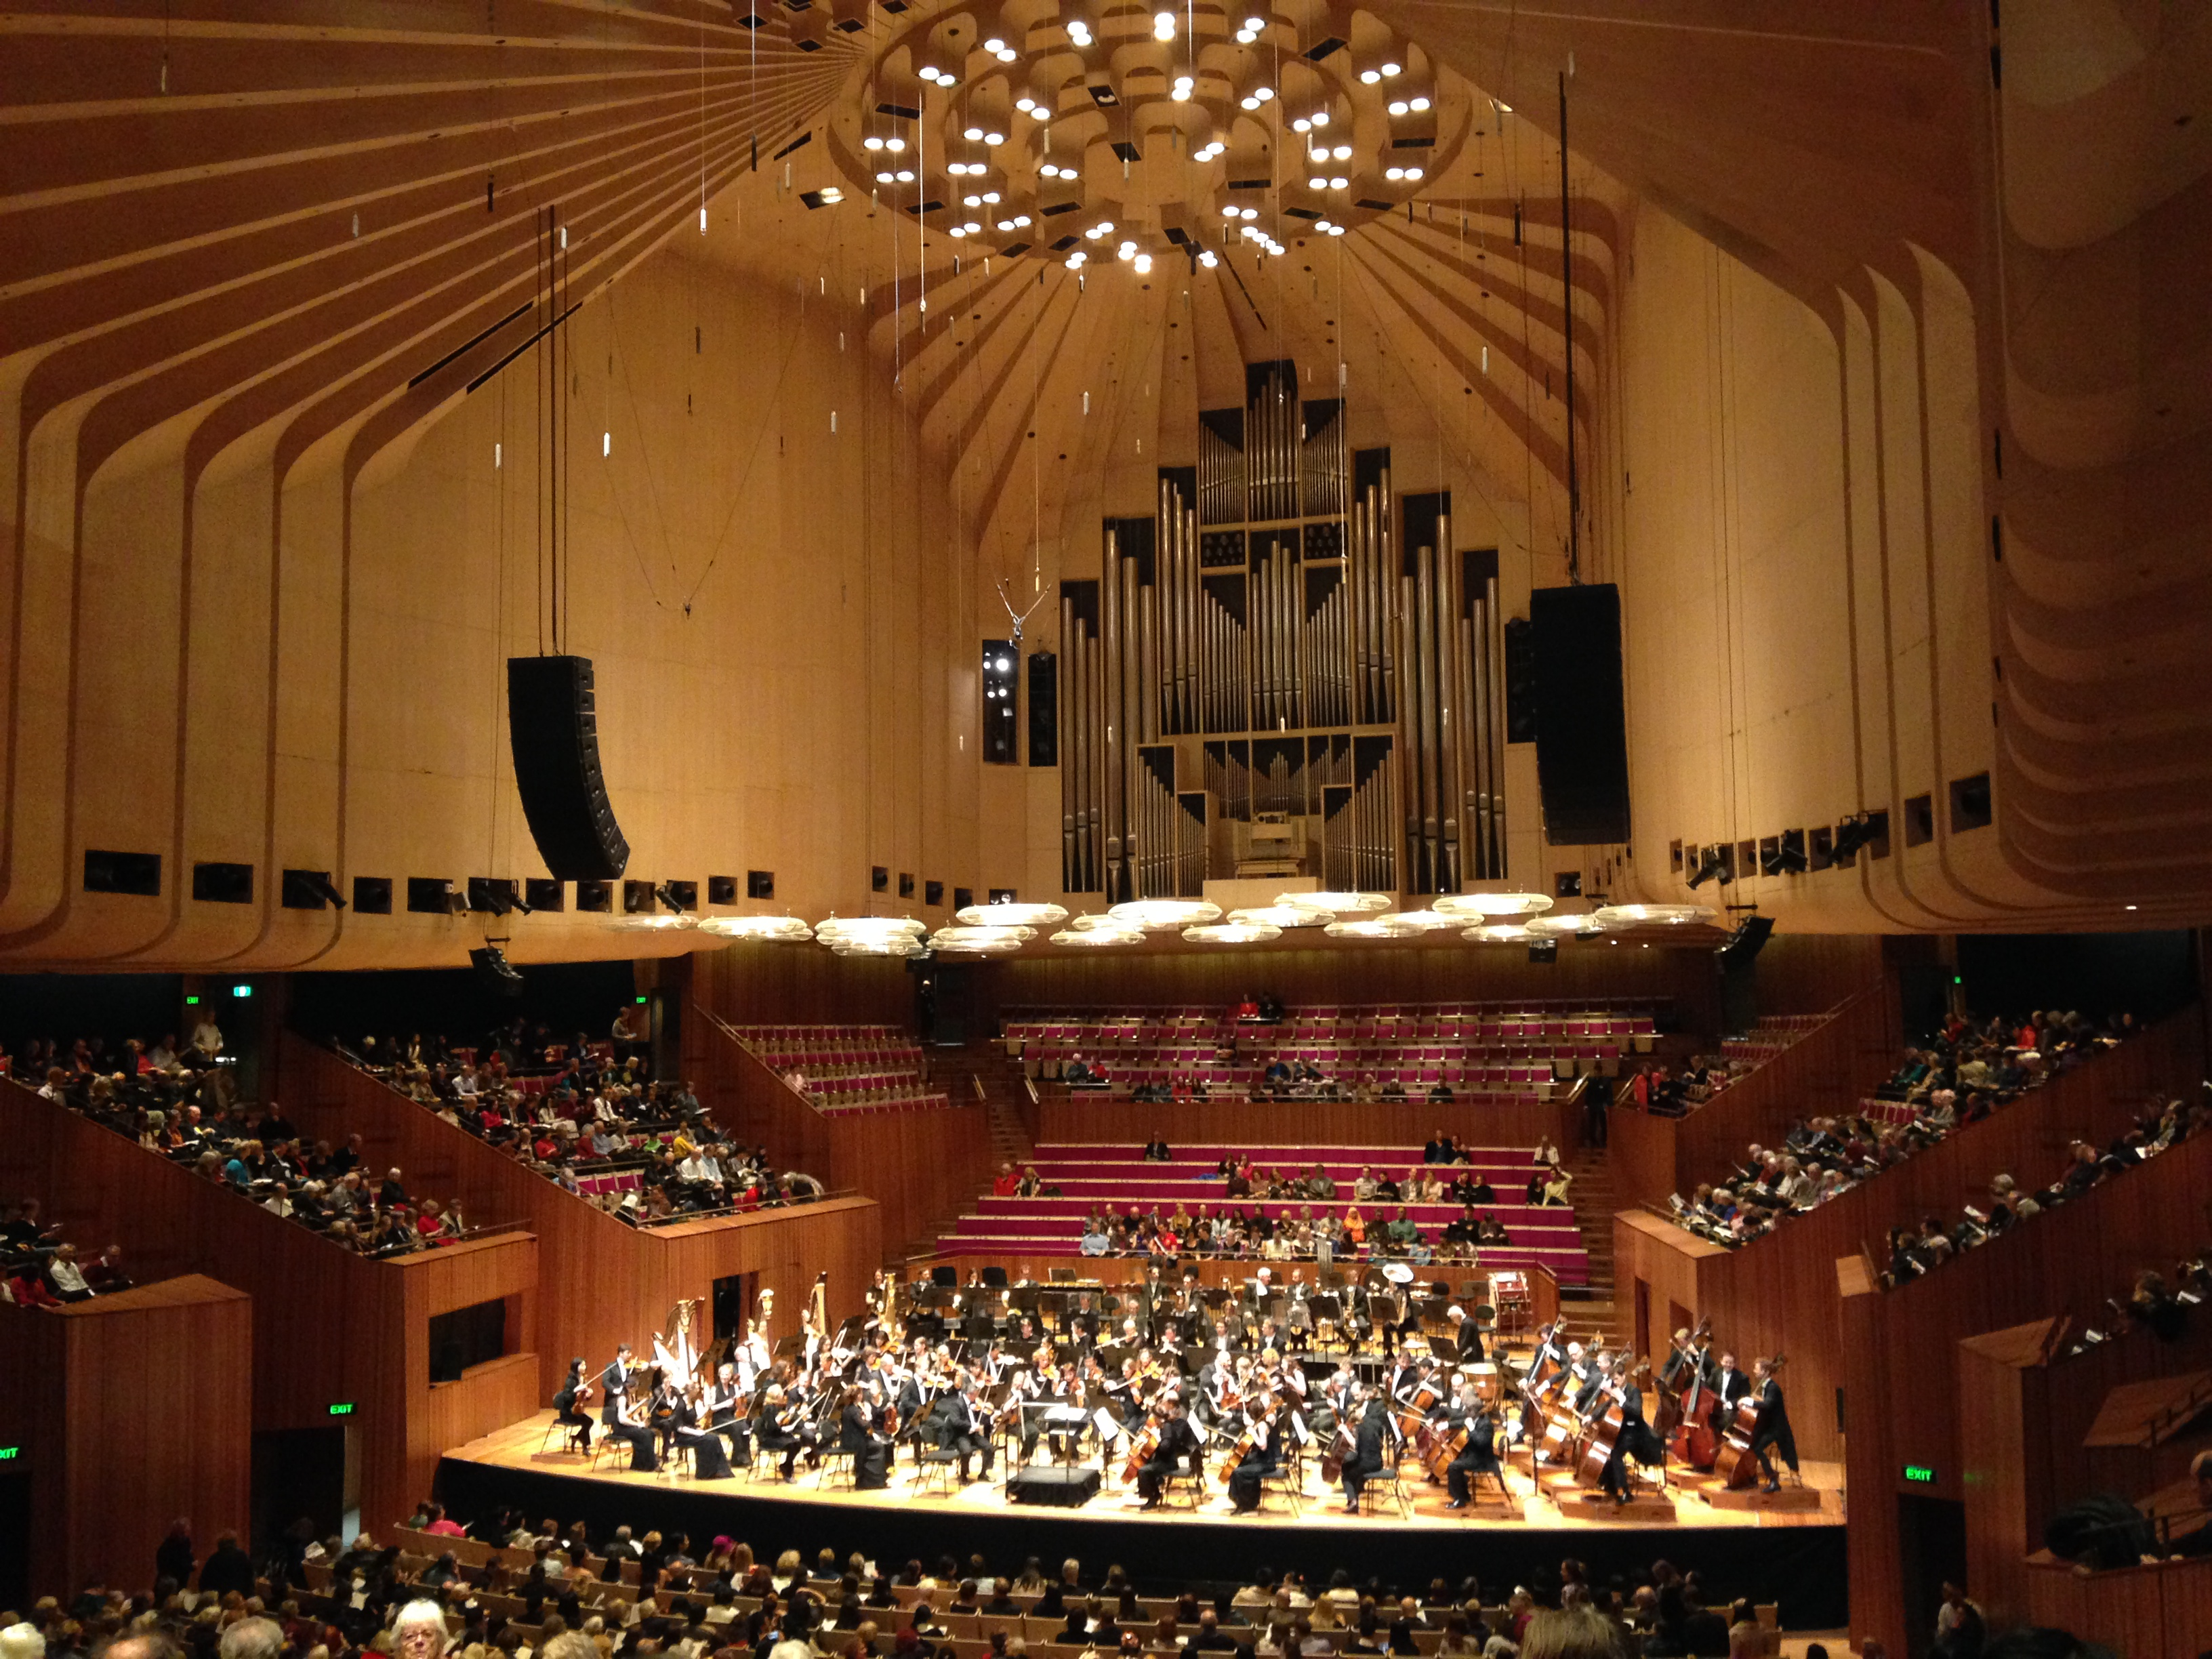 Sydney Opera House Concert Hall Akustik Dan Karakter A